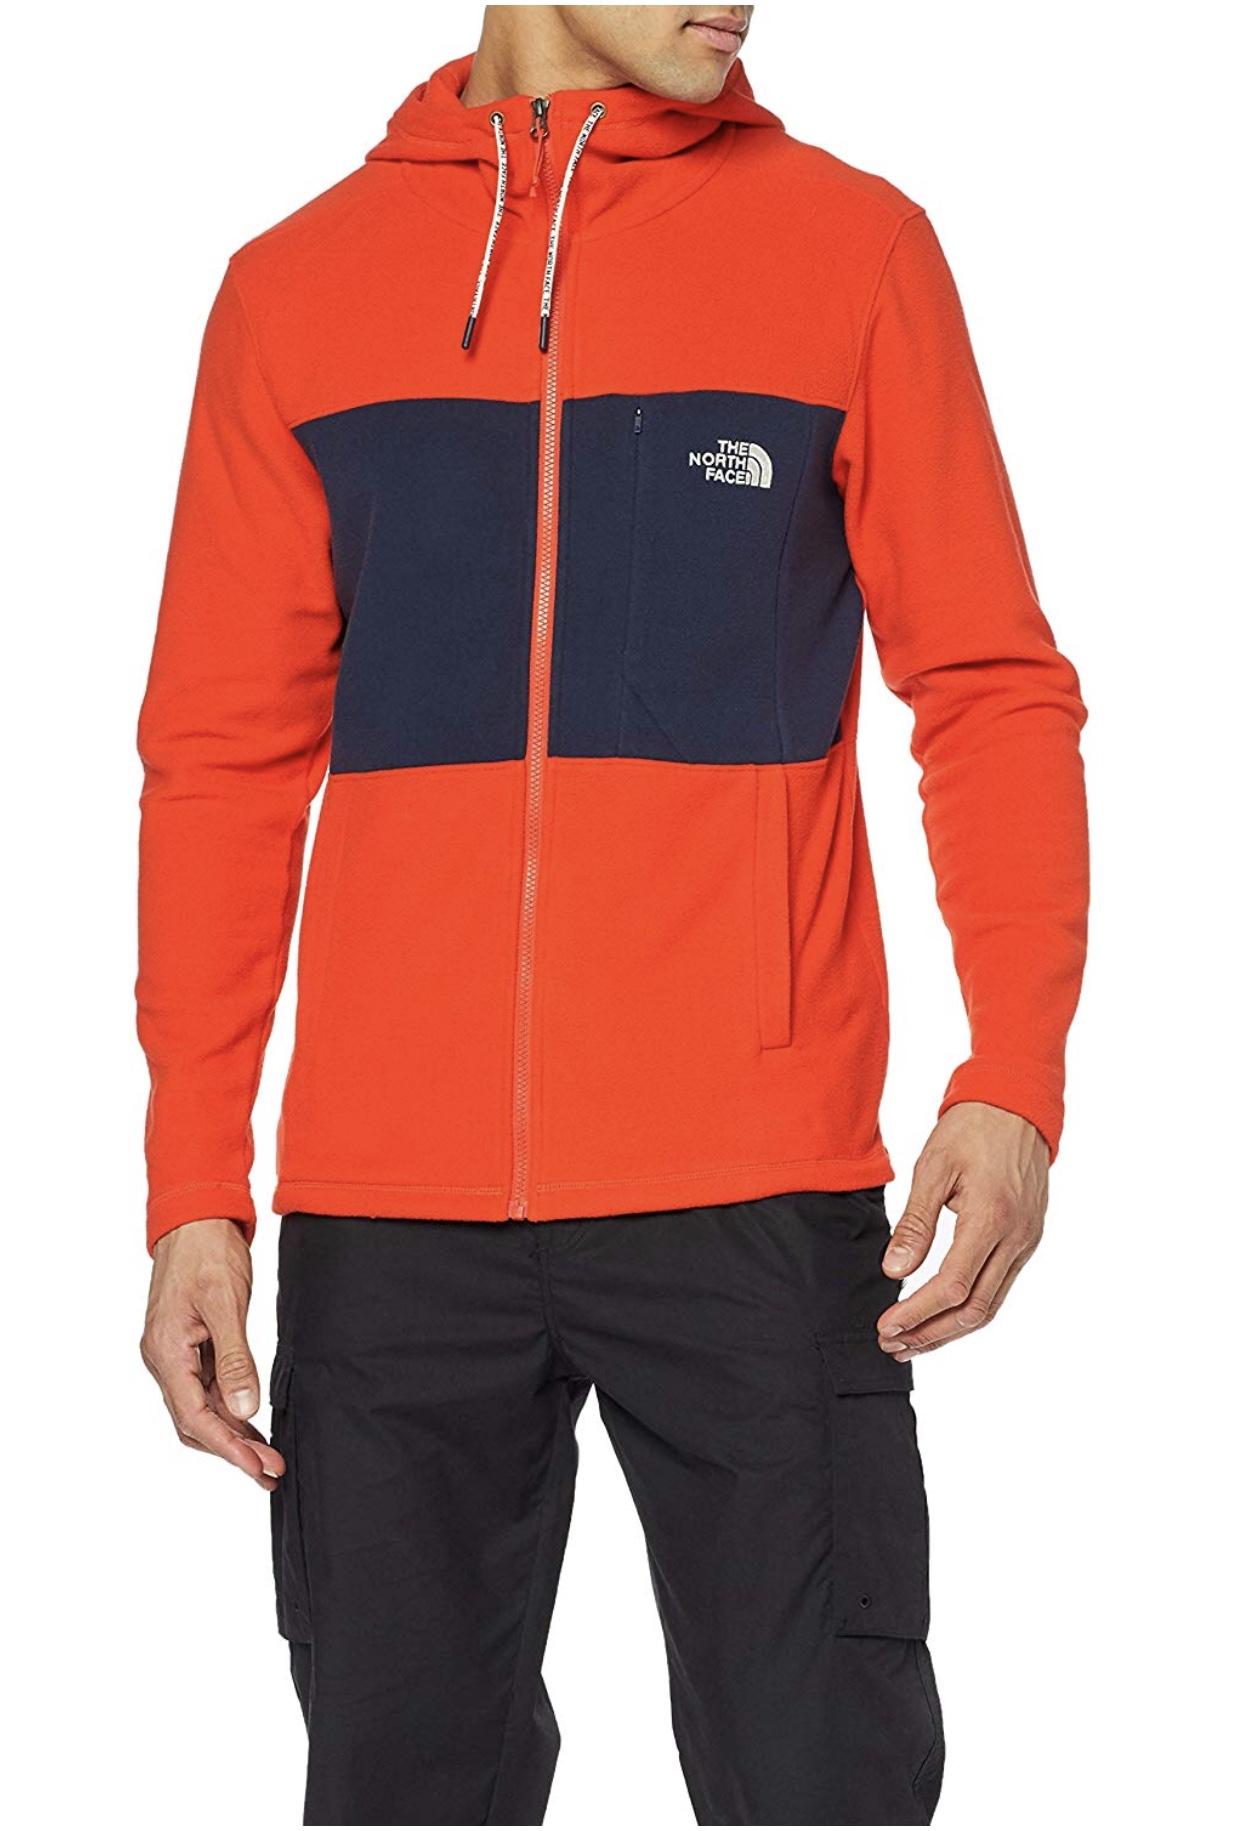 Men's Blocked Tka 100 Full Zip Hoodie Size M Only - £27.22 @ Amazon